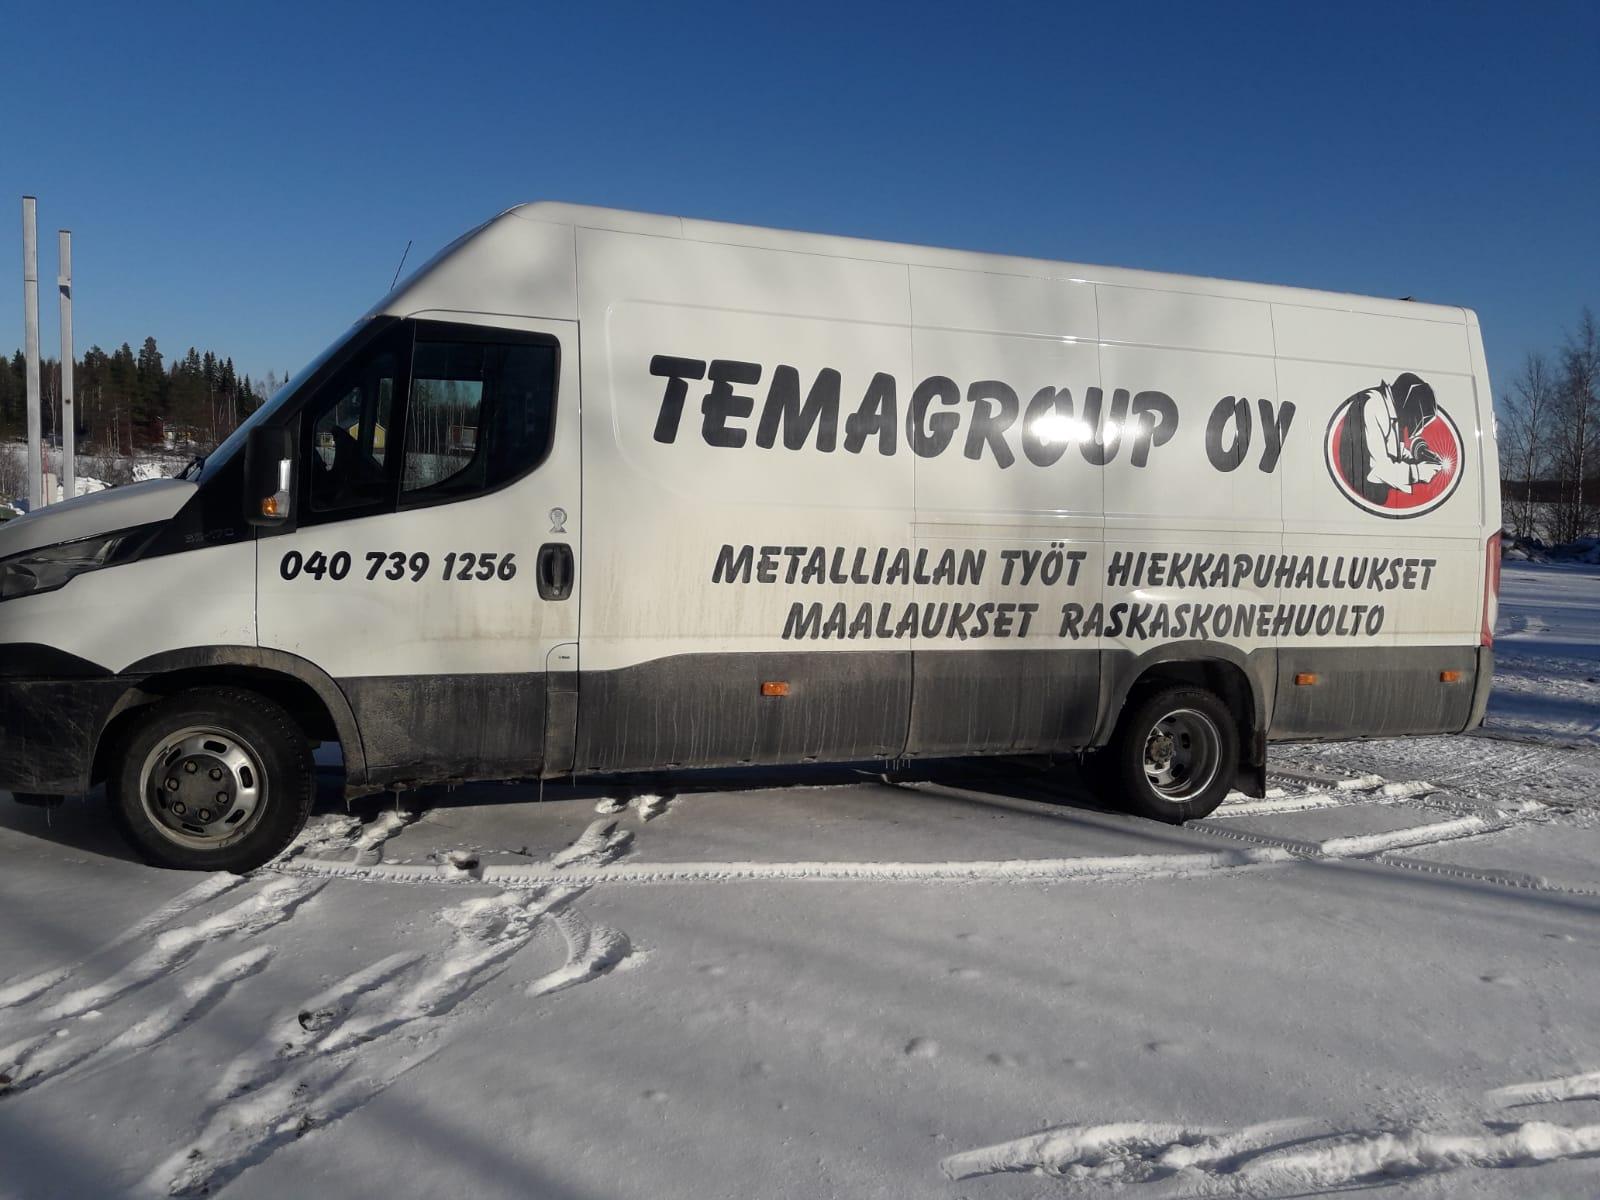 Temagroup.fi